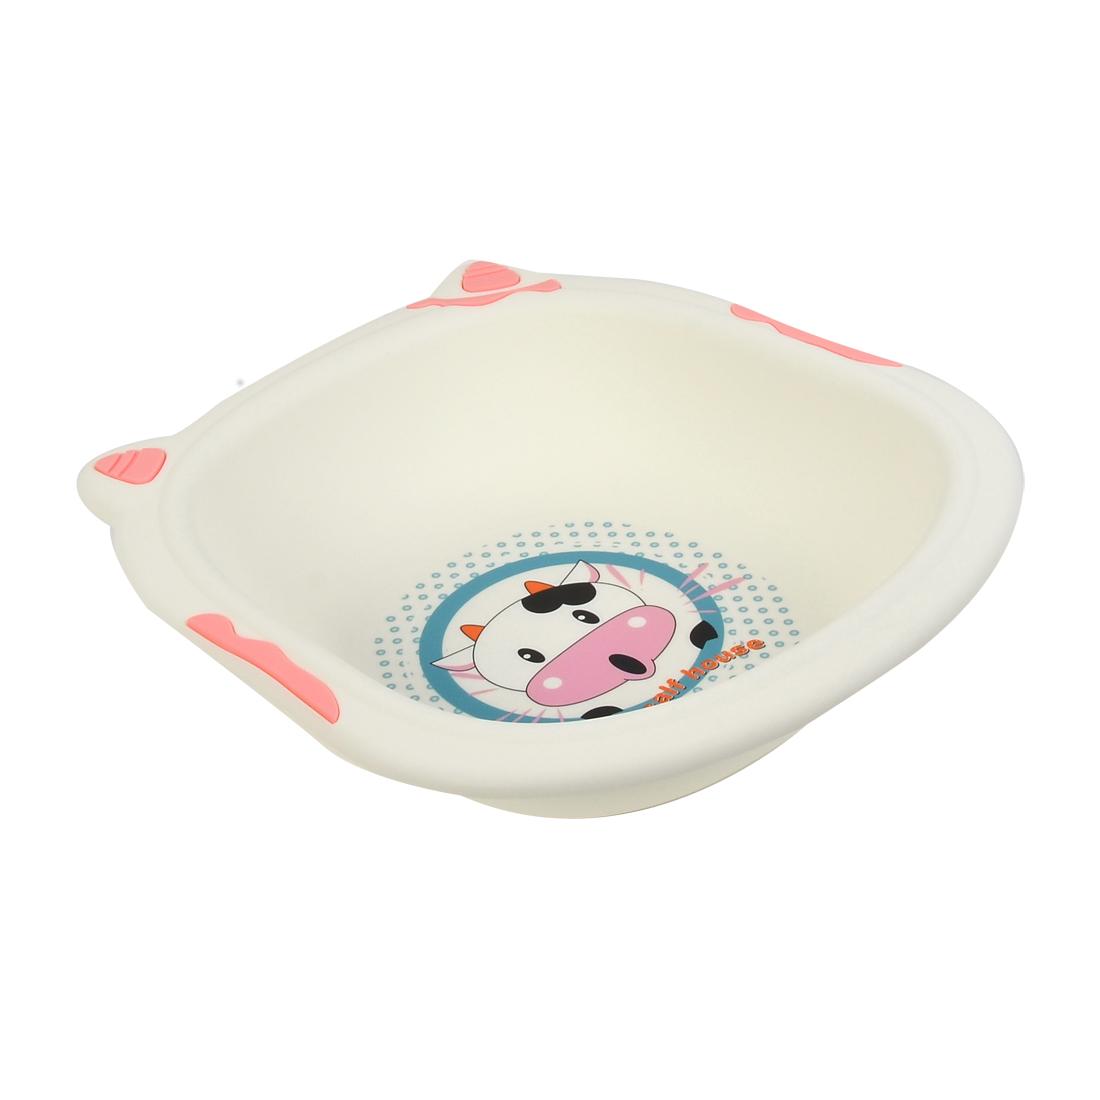 Plastic Cartoon Cow Pattern Washing Basin Dish Pan 36cm x 34cm x 8cm Pink